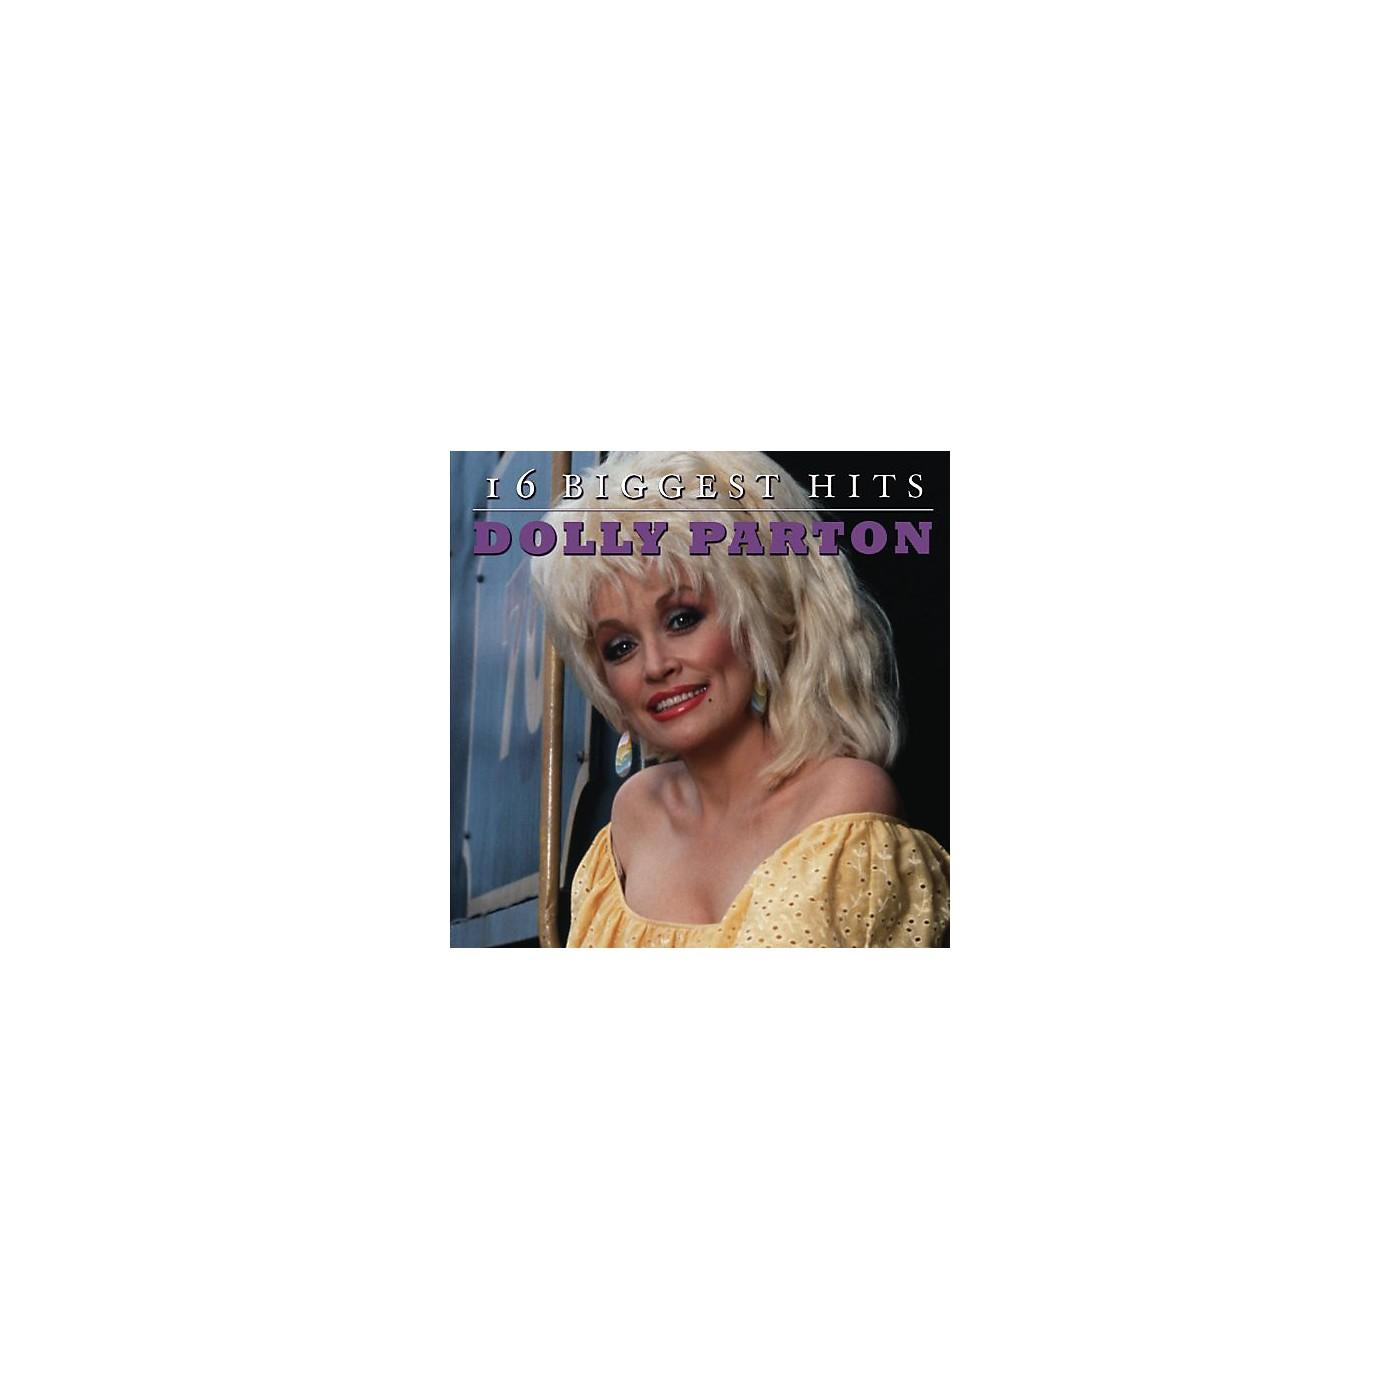 Alliance Dolly Parton - 16 Biggest Hits (CD) thumbnail